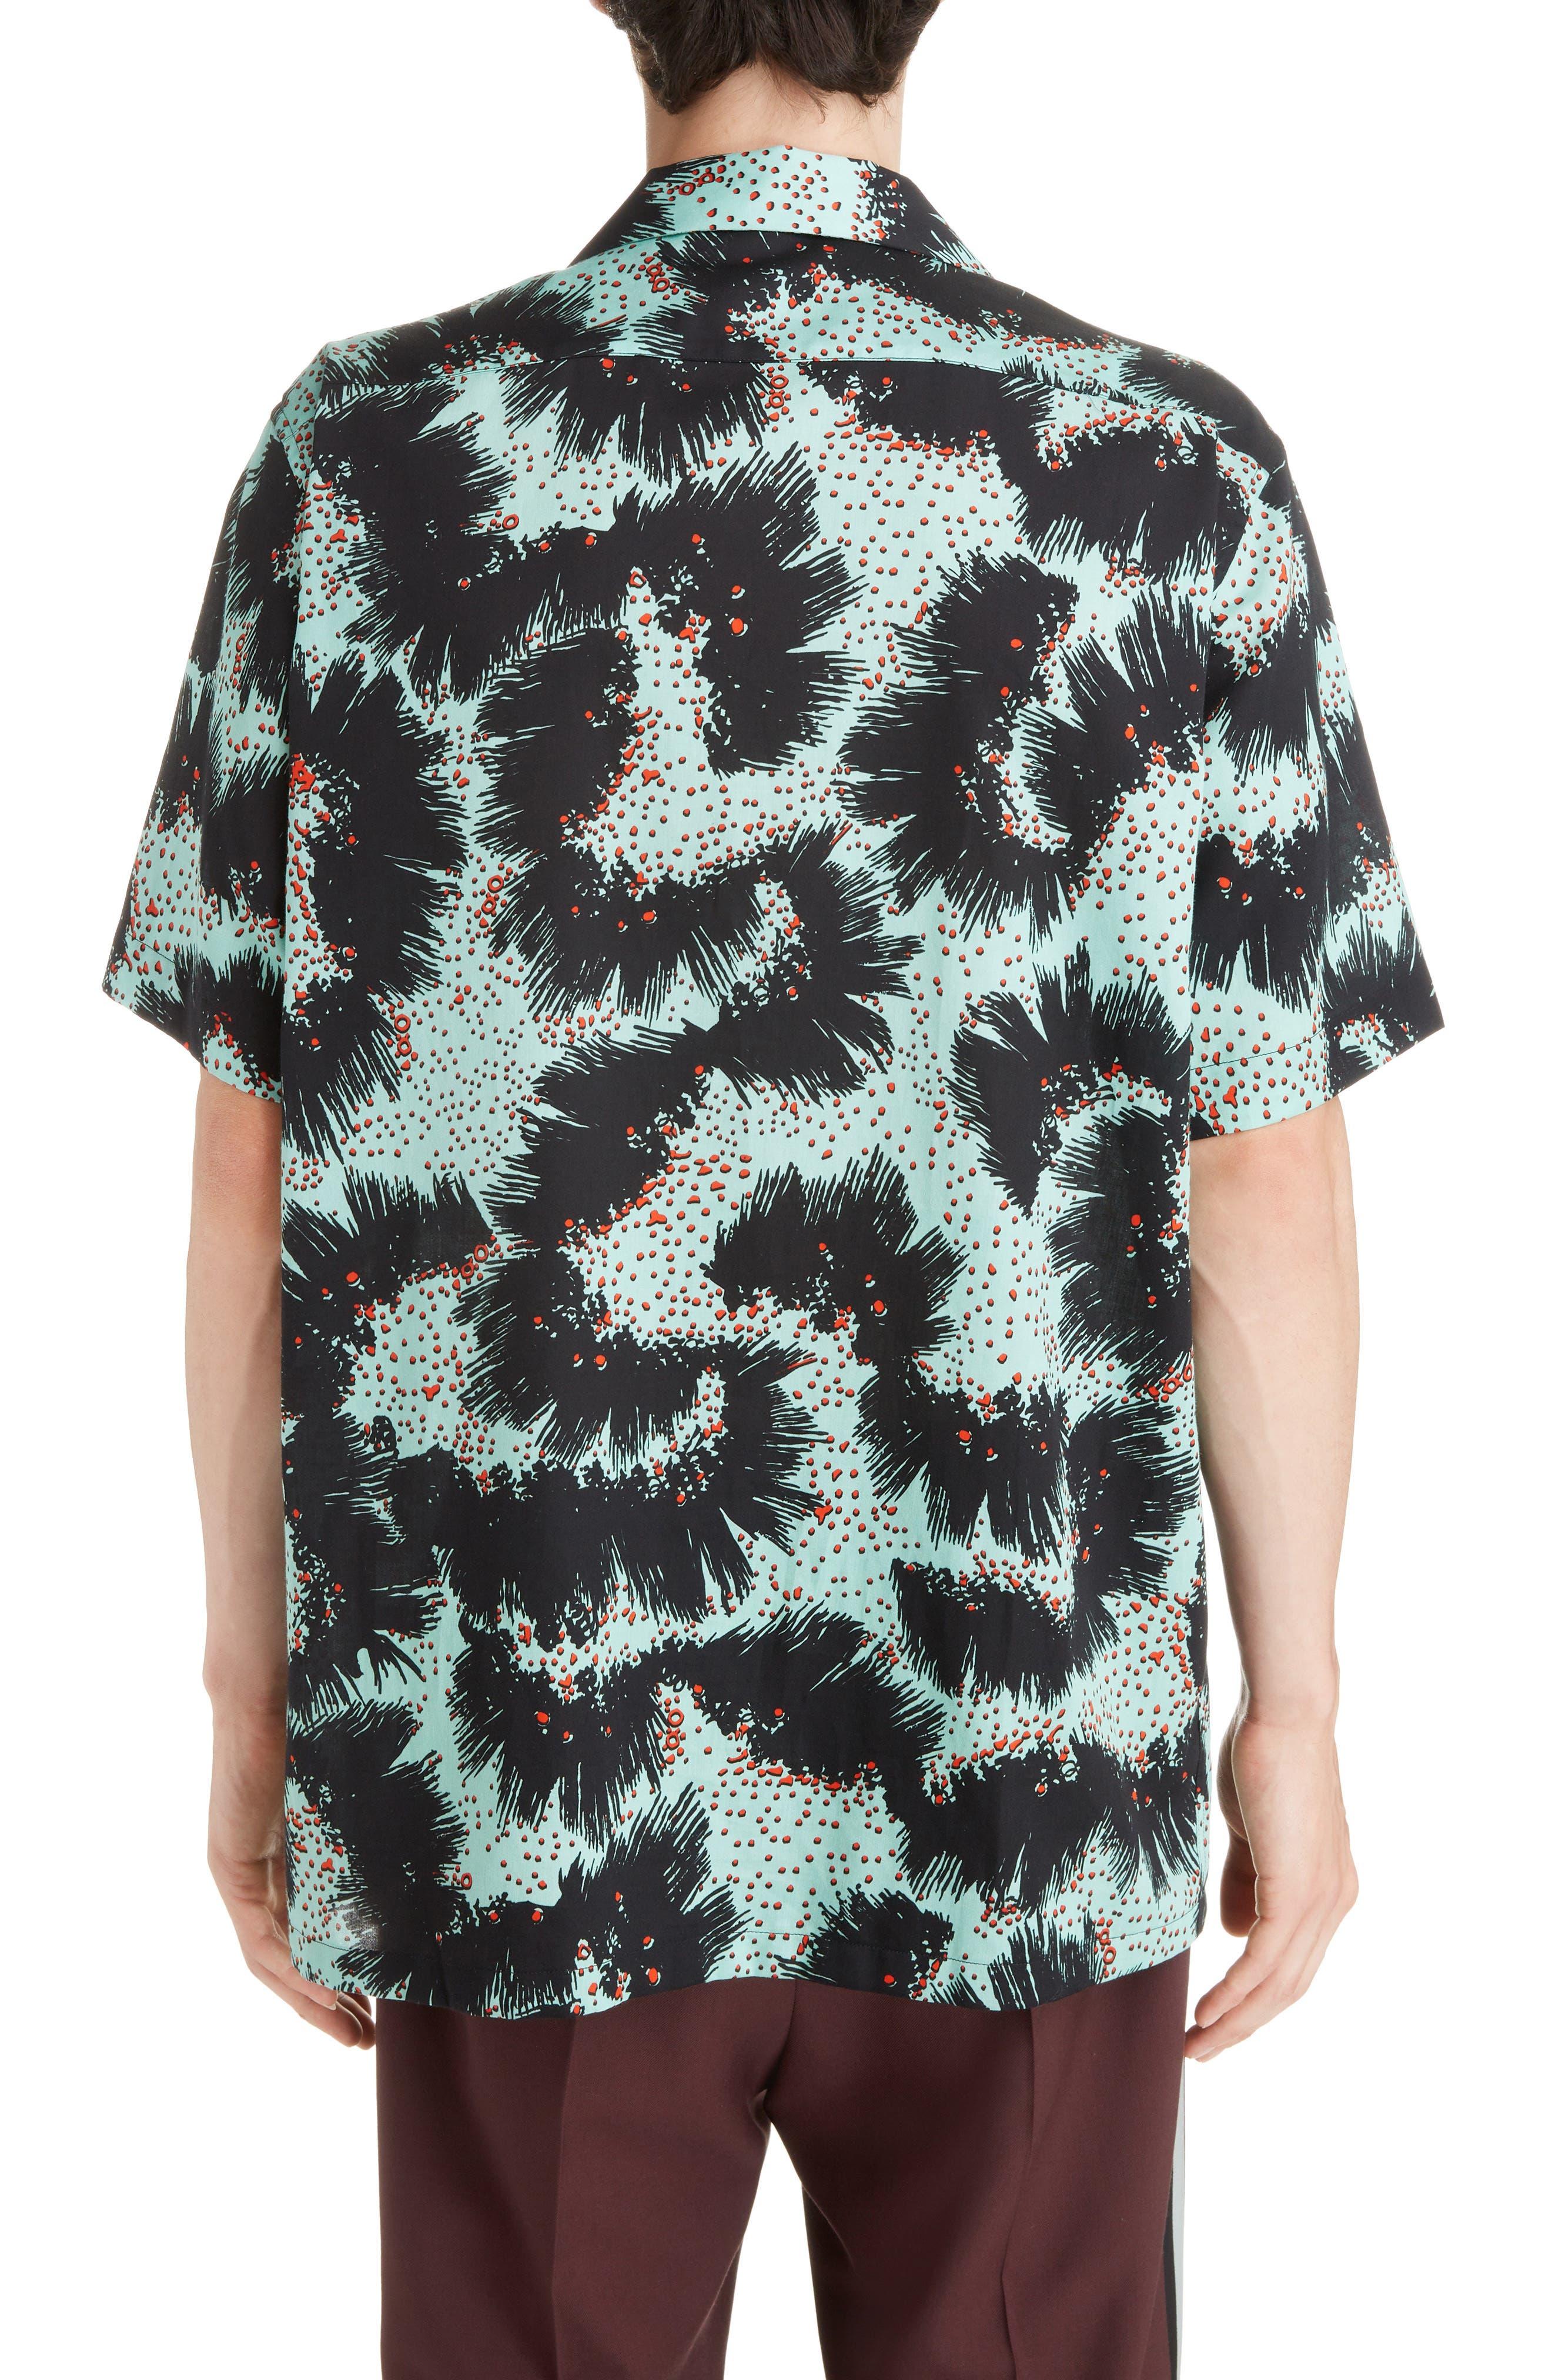 Rock Urchin Camp Shirt,                             Alternate thumbnail 3, color,                             GREEN/BLACK